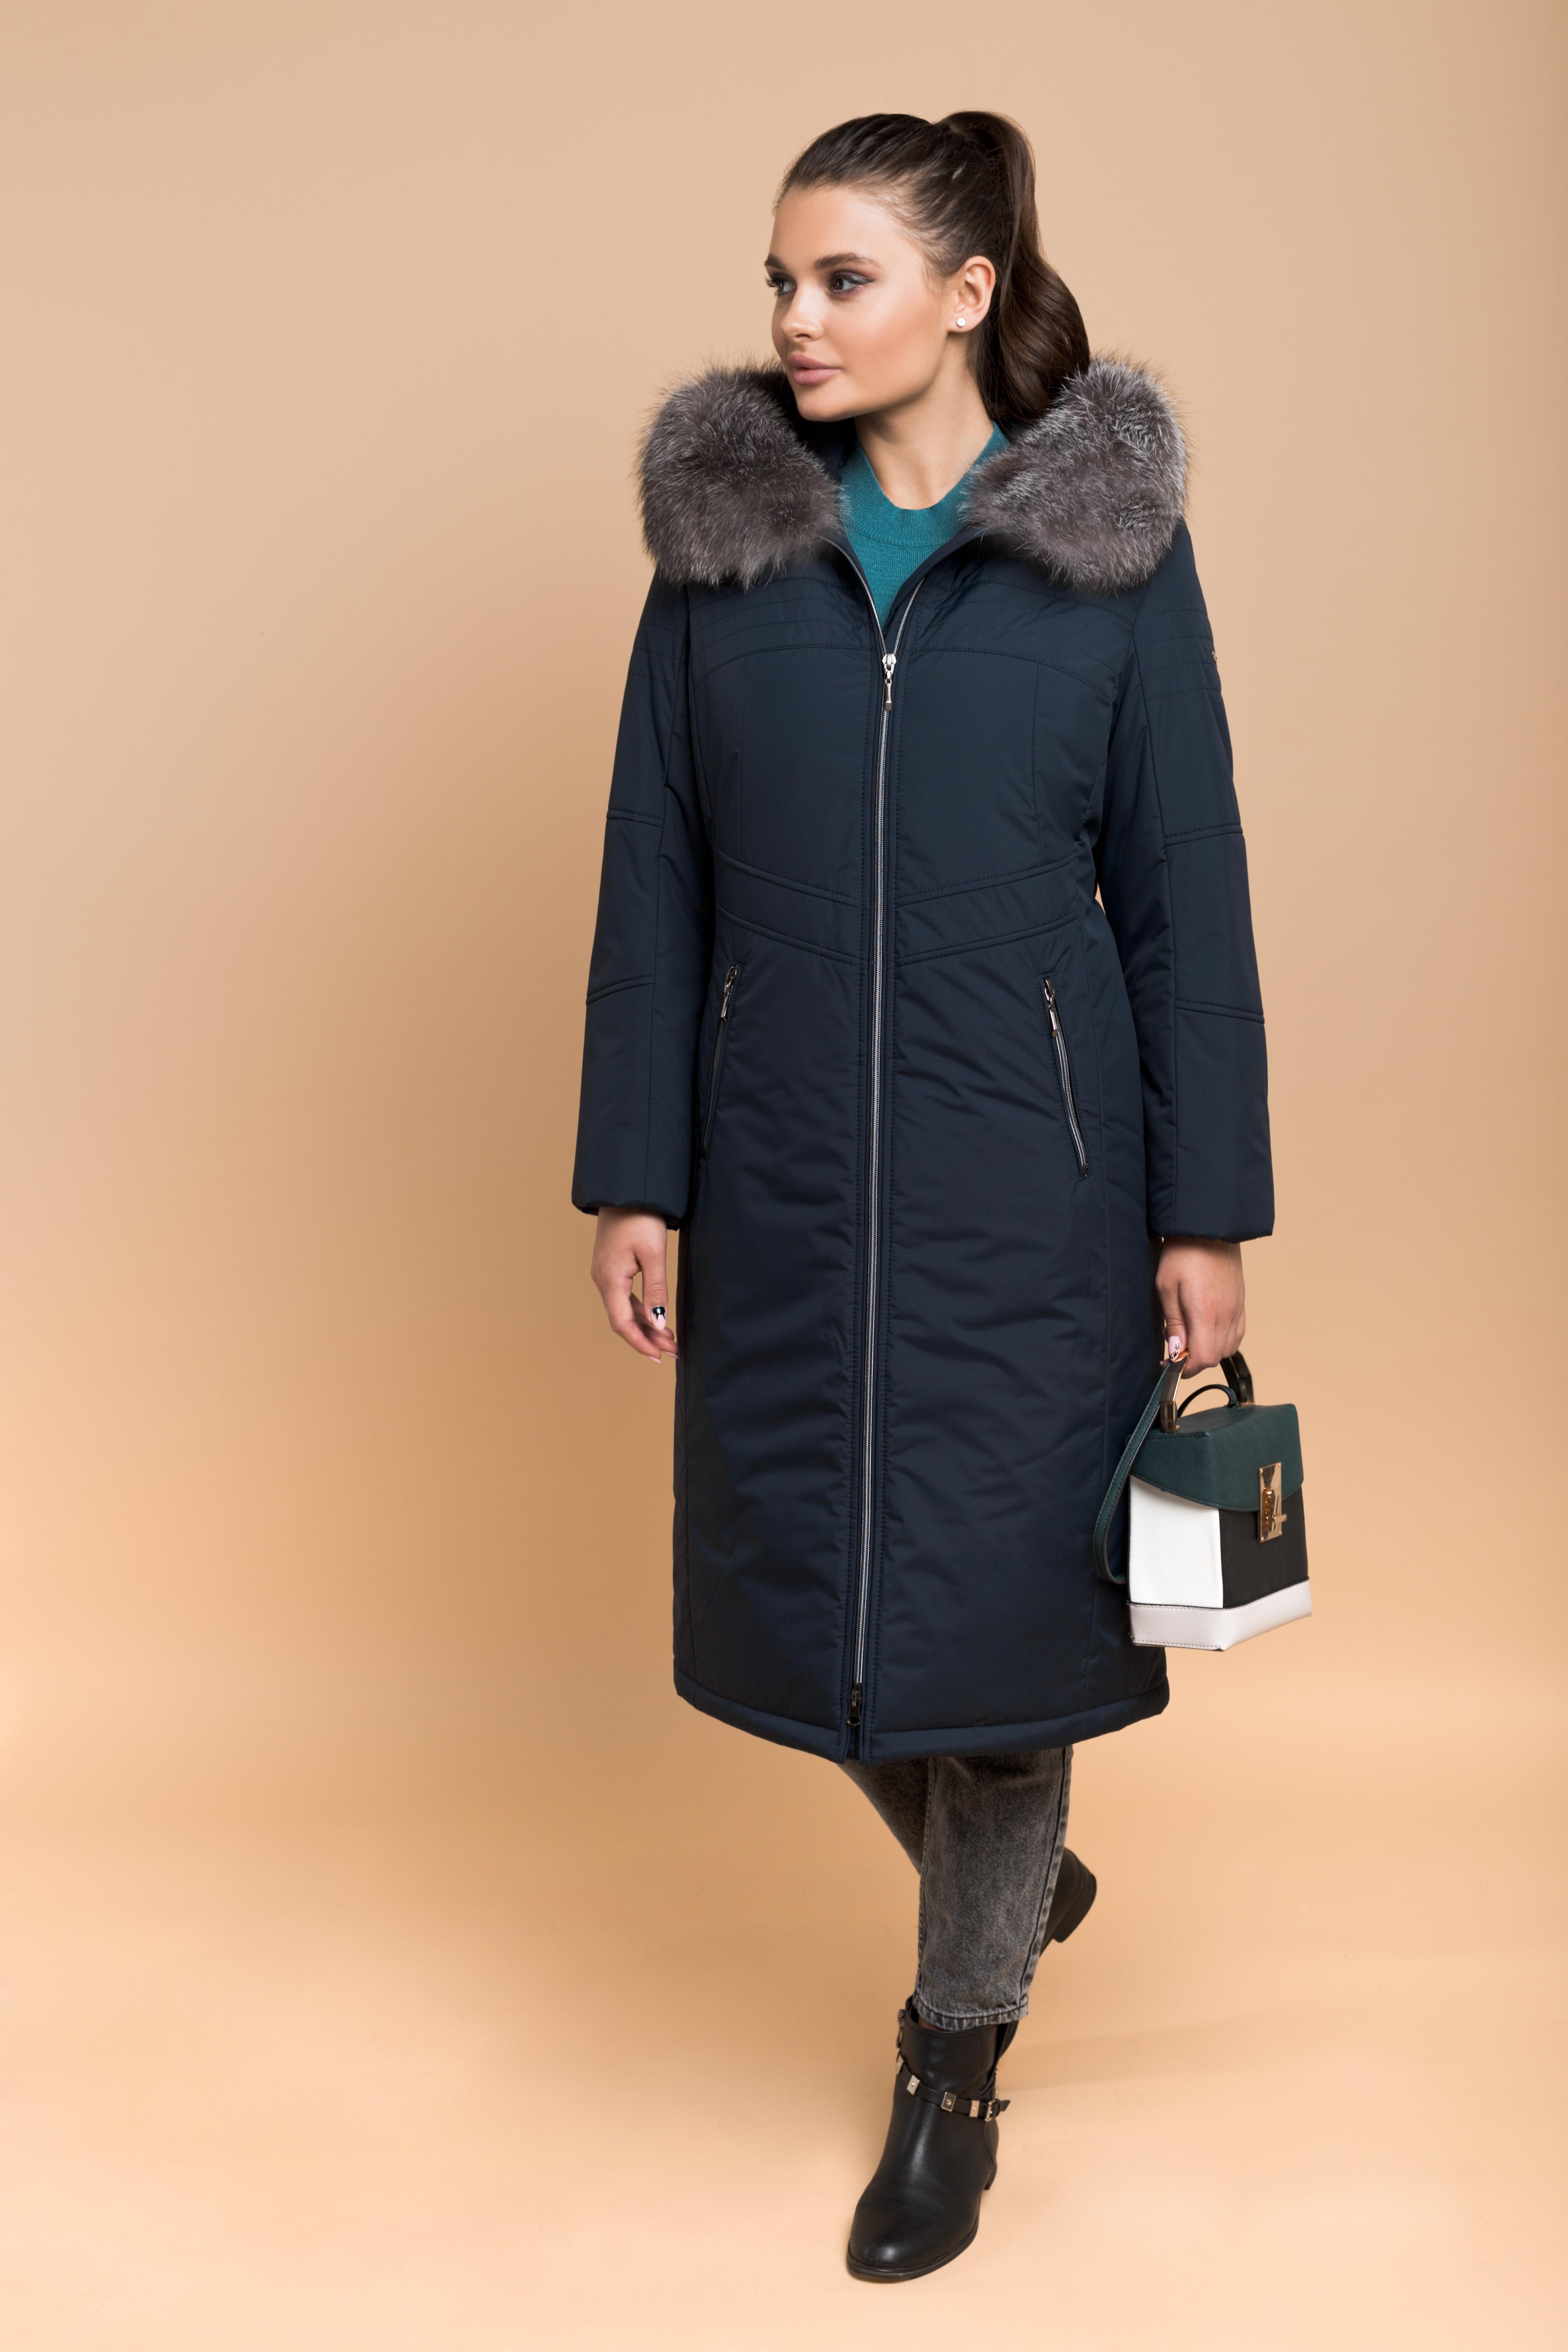 Пальто женское зима 894F Nord Wind — фото 5